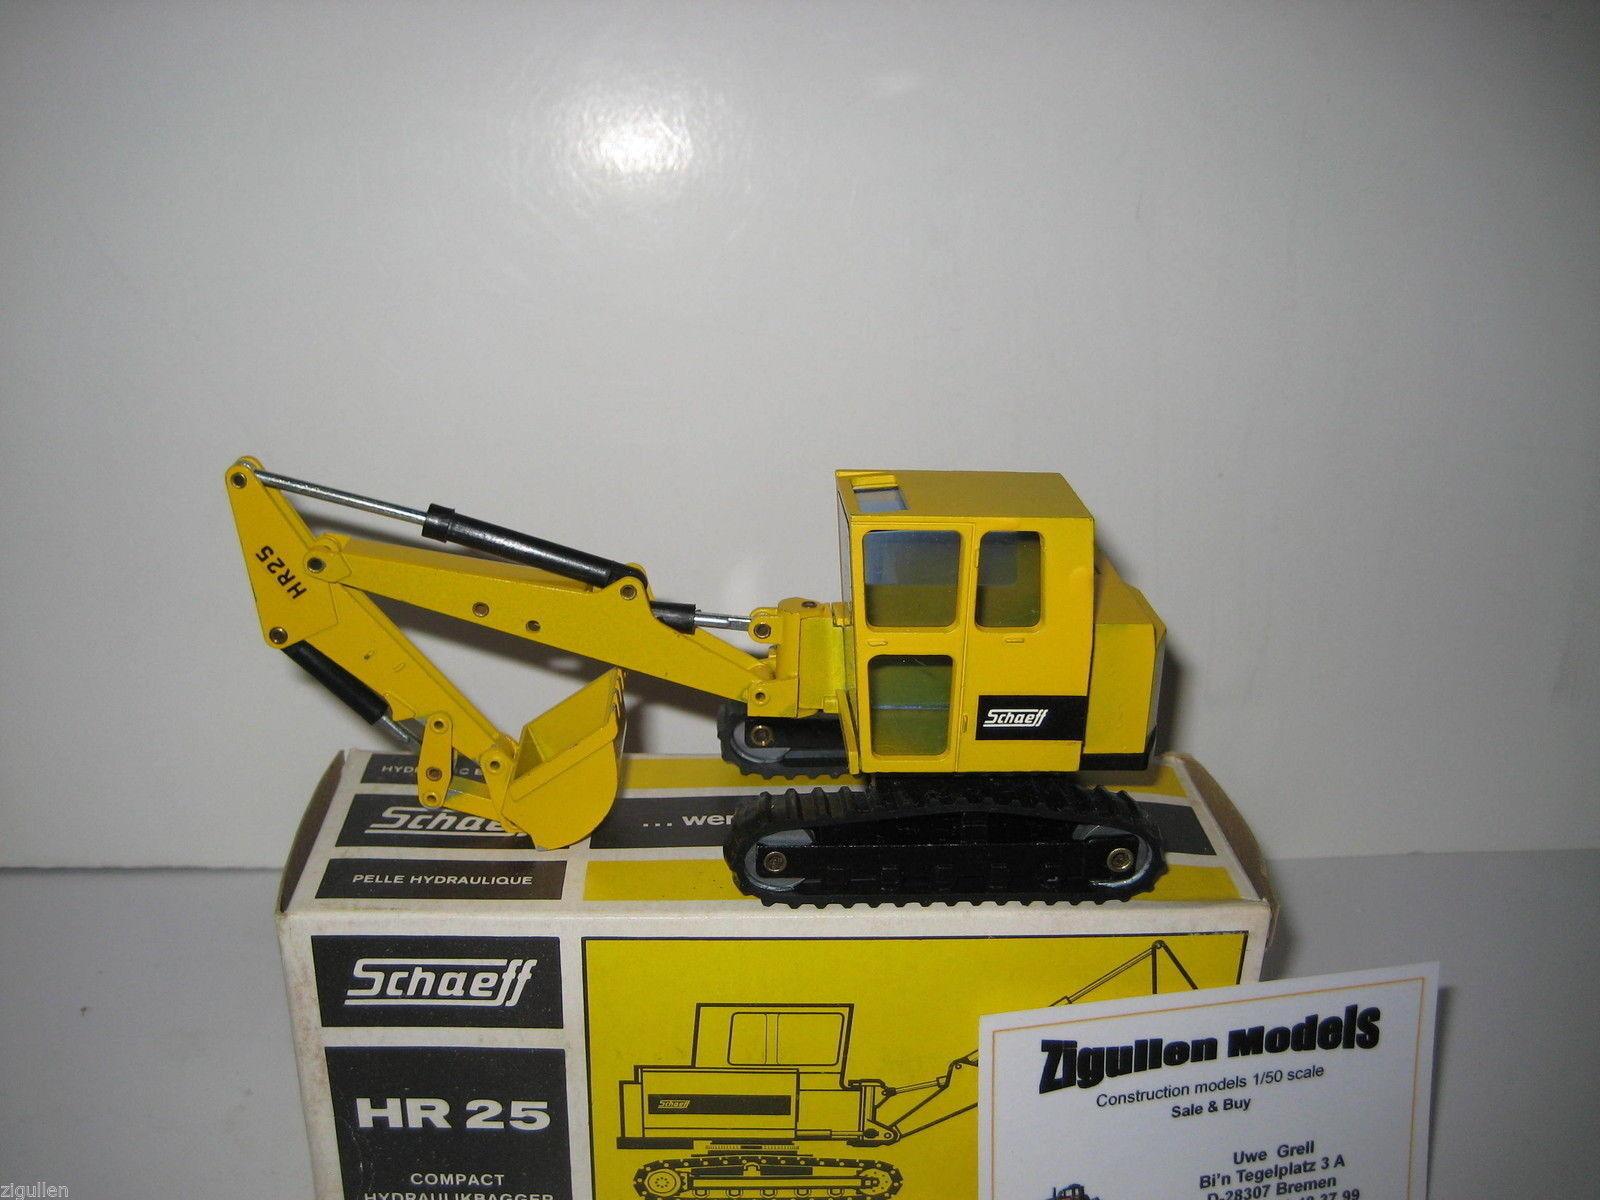 Schaeff HR 25 Excavateurs tieflöffel vers à soie  107.2 NZG 1 35 neuf dans sa boîte